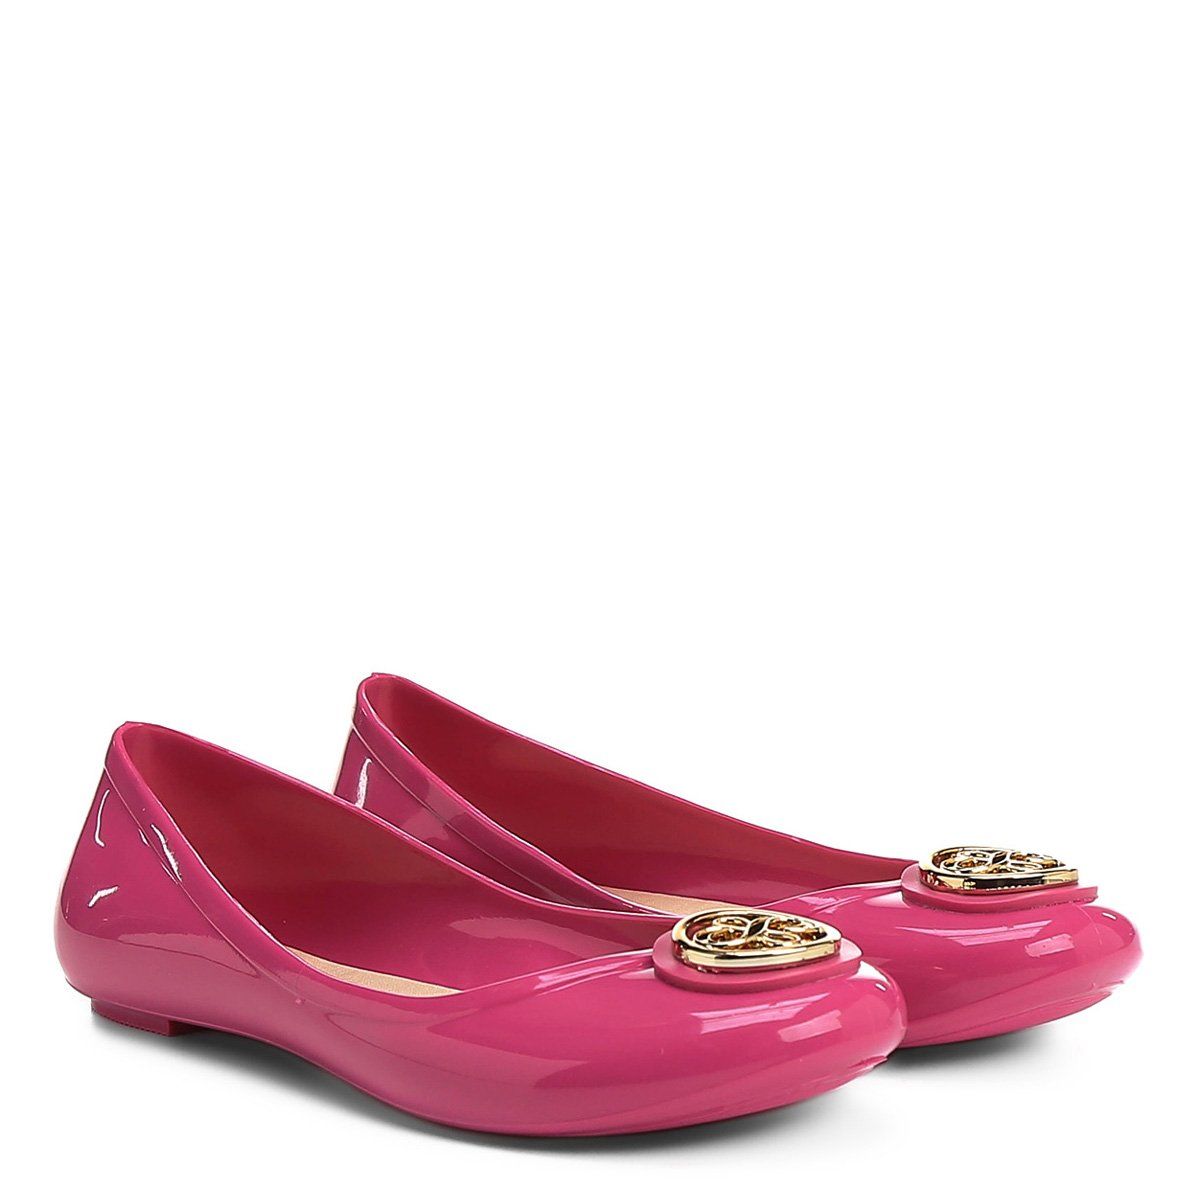 046c8744fc Sapatilha Shoestock Injetada Medalha Infantil - Rosa